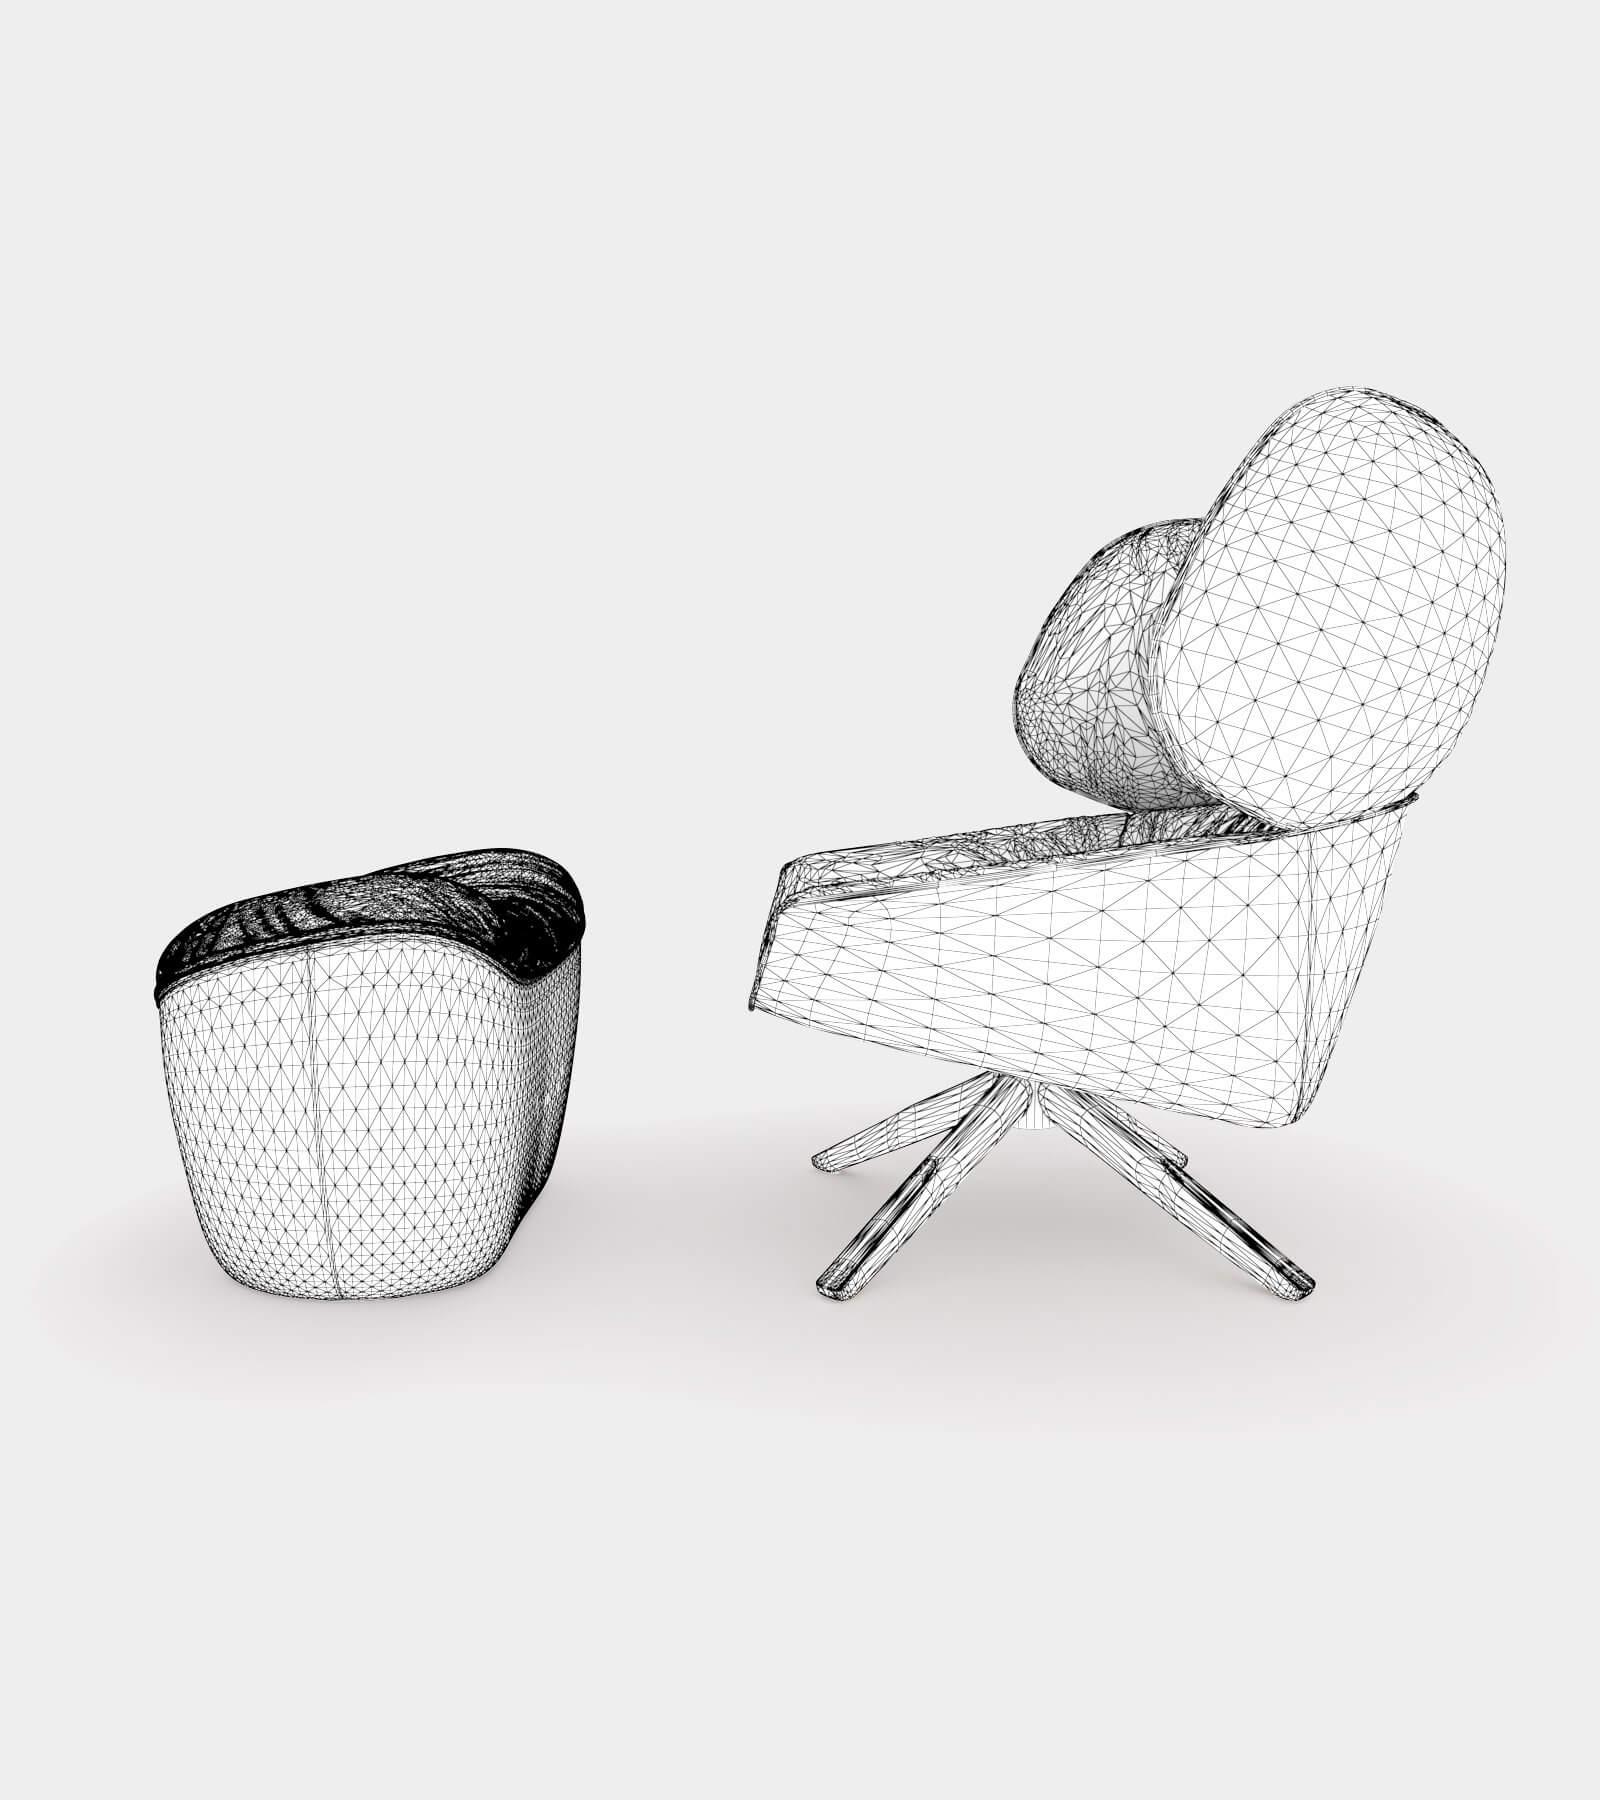 Armchair with headrest ears-wire-2 3D Model